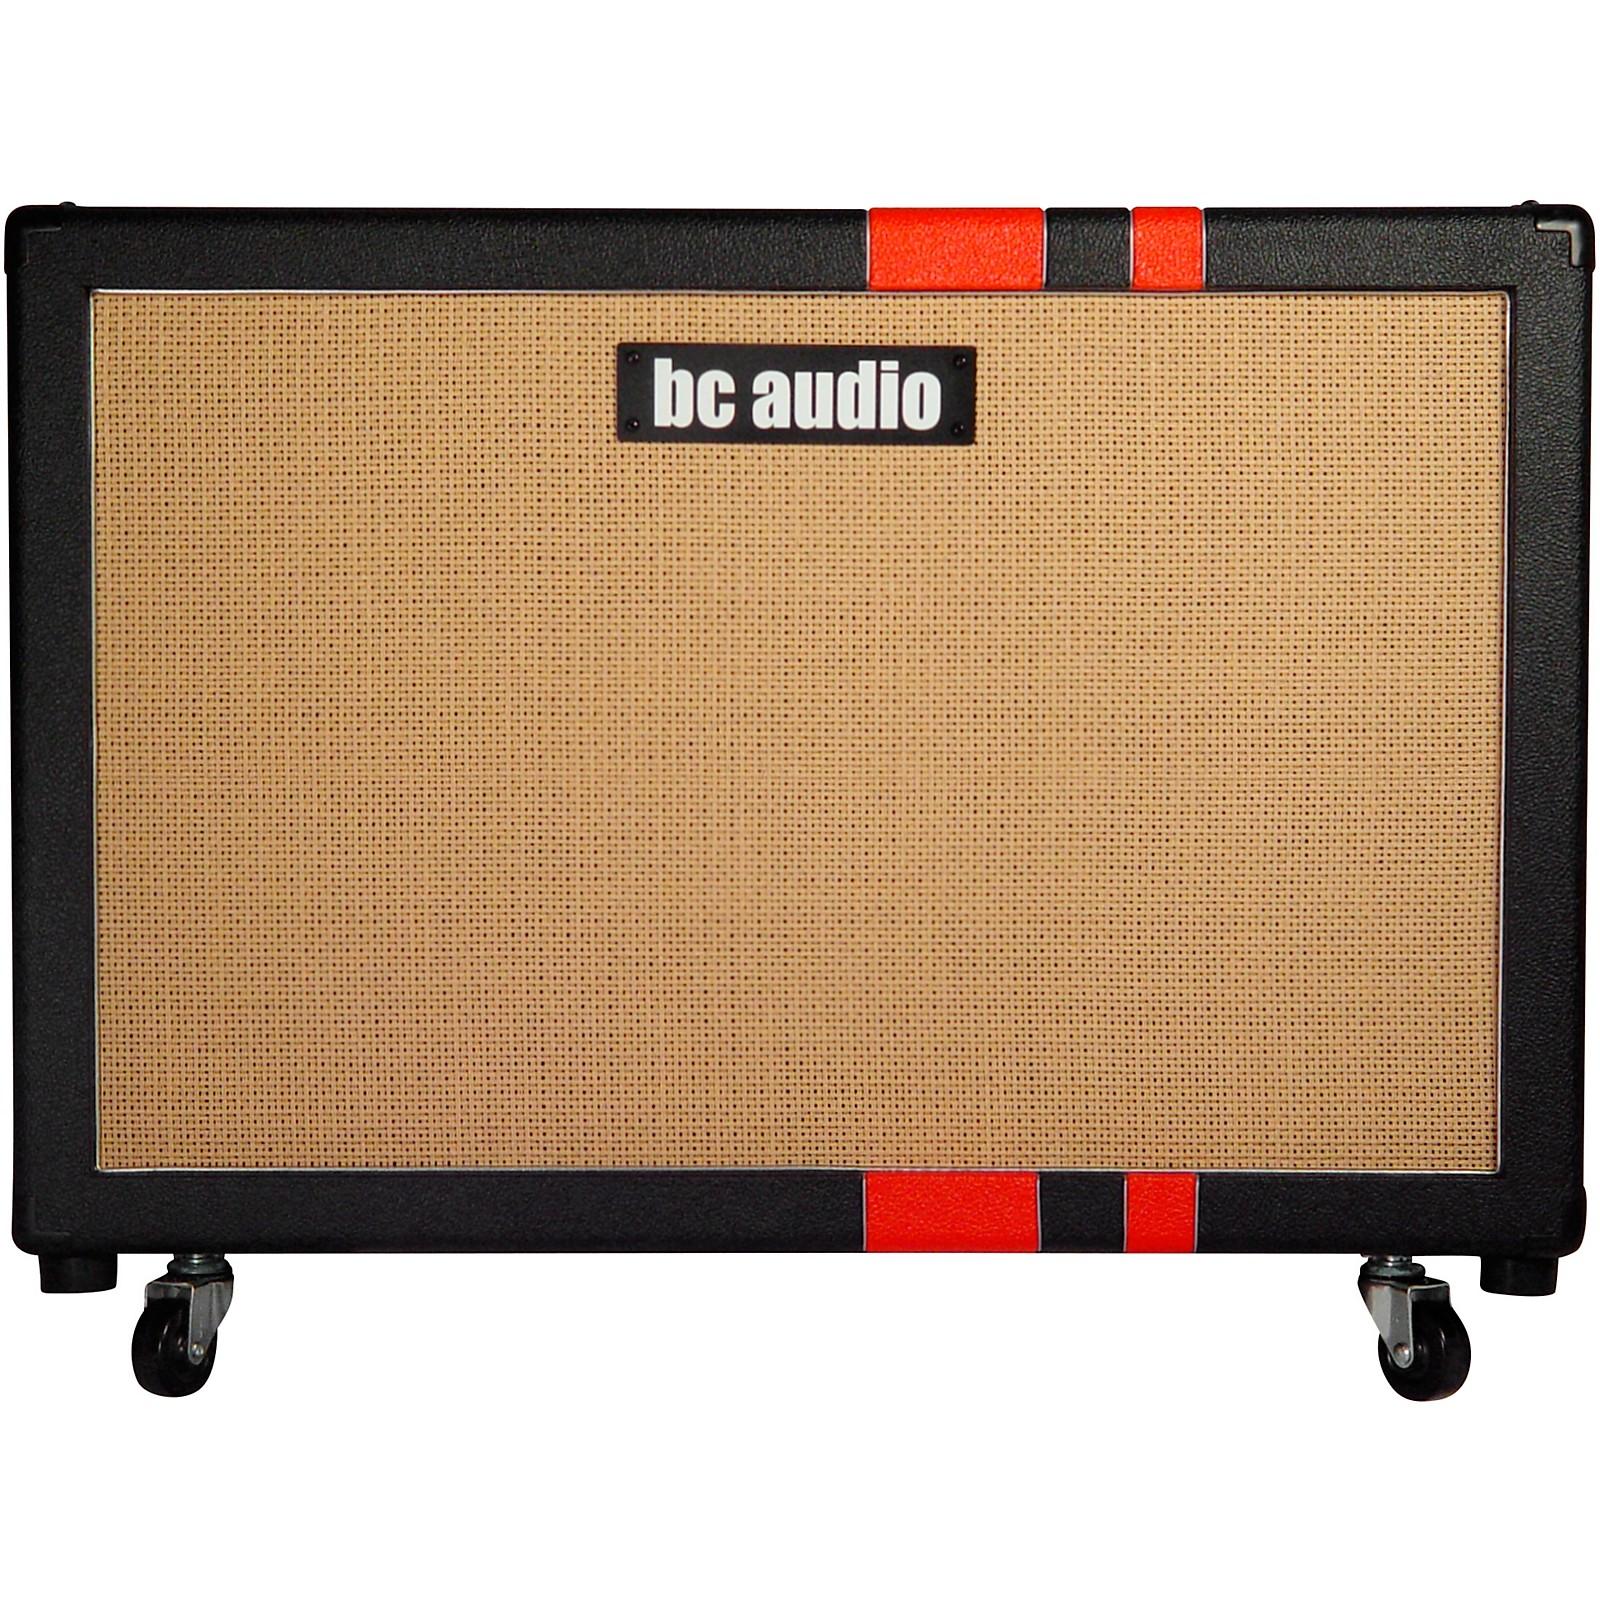 BC Audio 2x12 Horizontal 150W 2x12 Guitar Speaker Cabinet